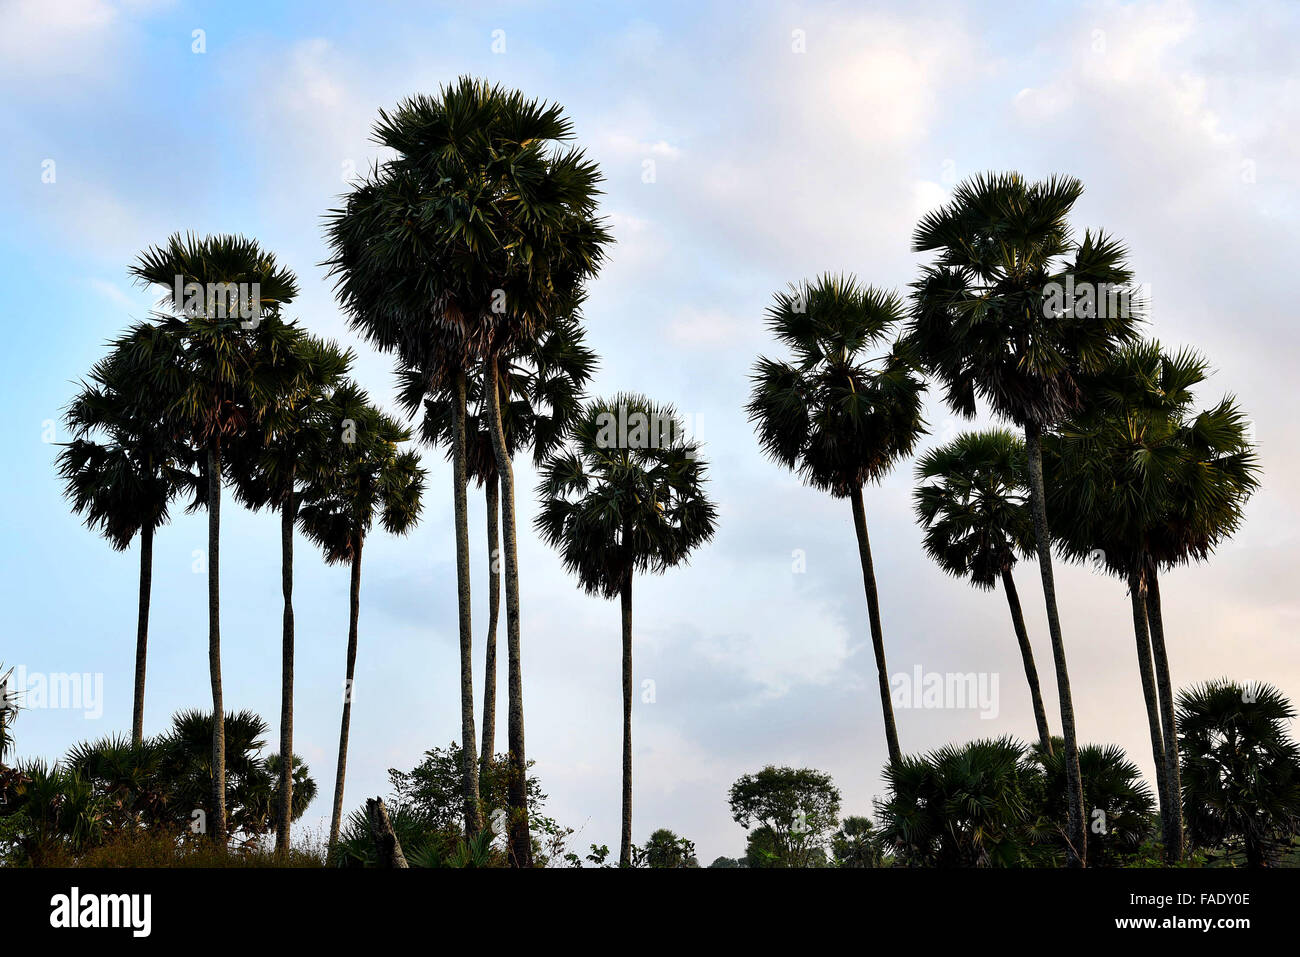 palam tree in palakkad,kerala,india,very big like coconut tree. - Stock Image